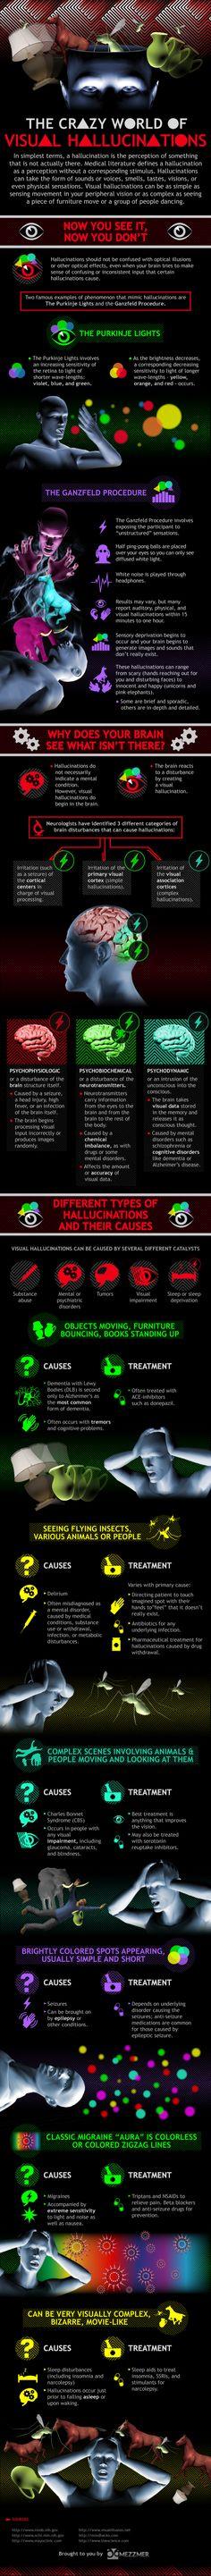 Visual hallucinations, a possible symptom during mania Les hallucinations visuelles, un symptôme possible pendant les manies